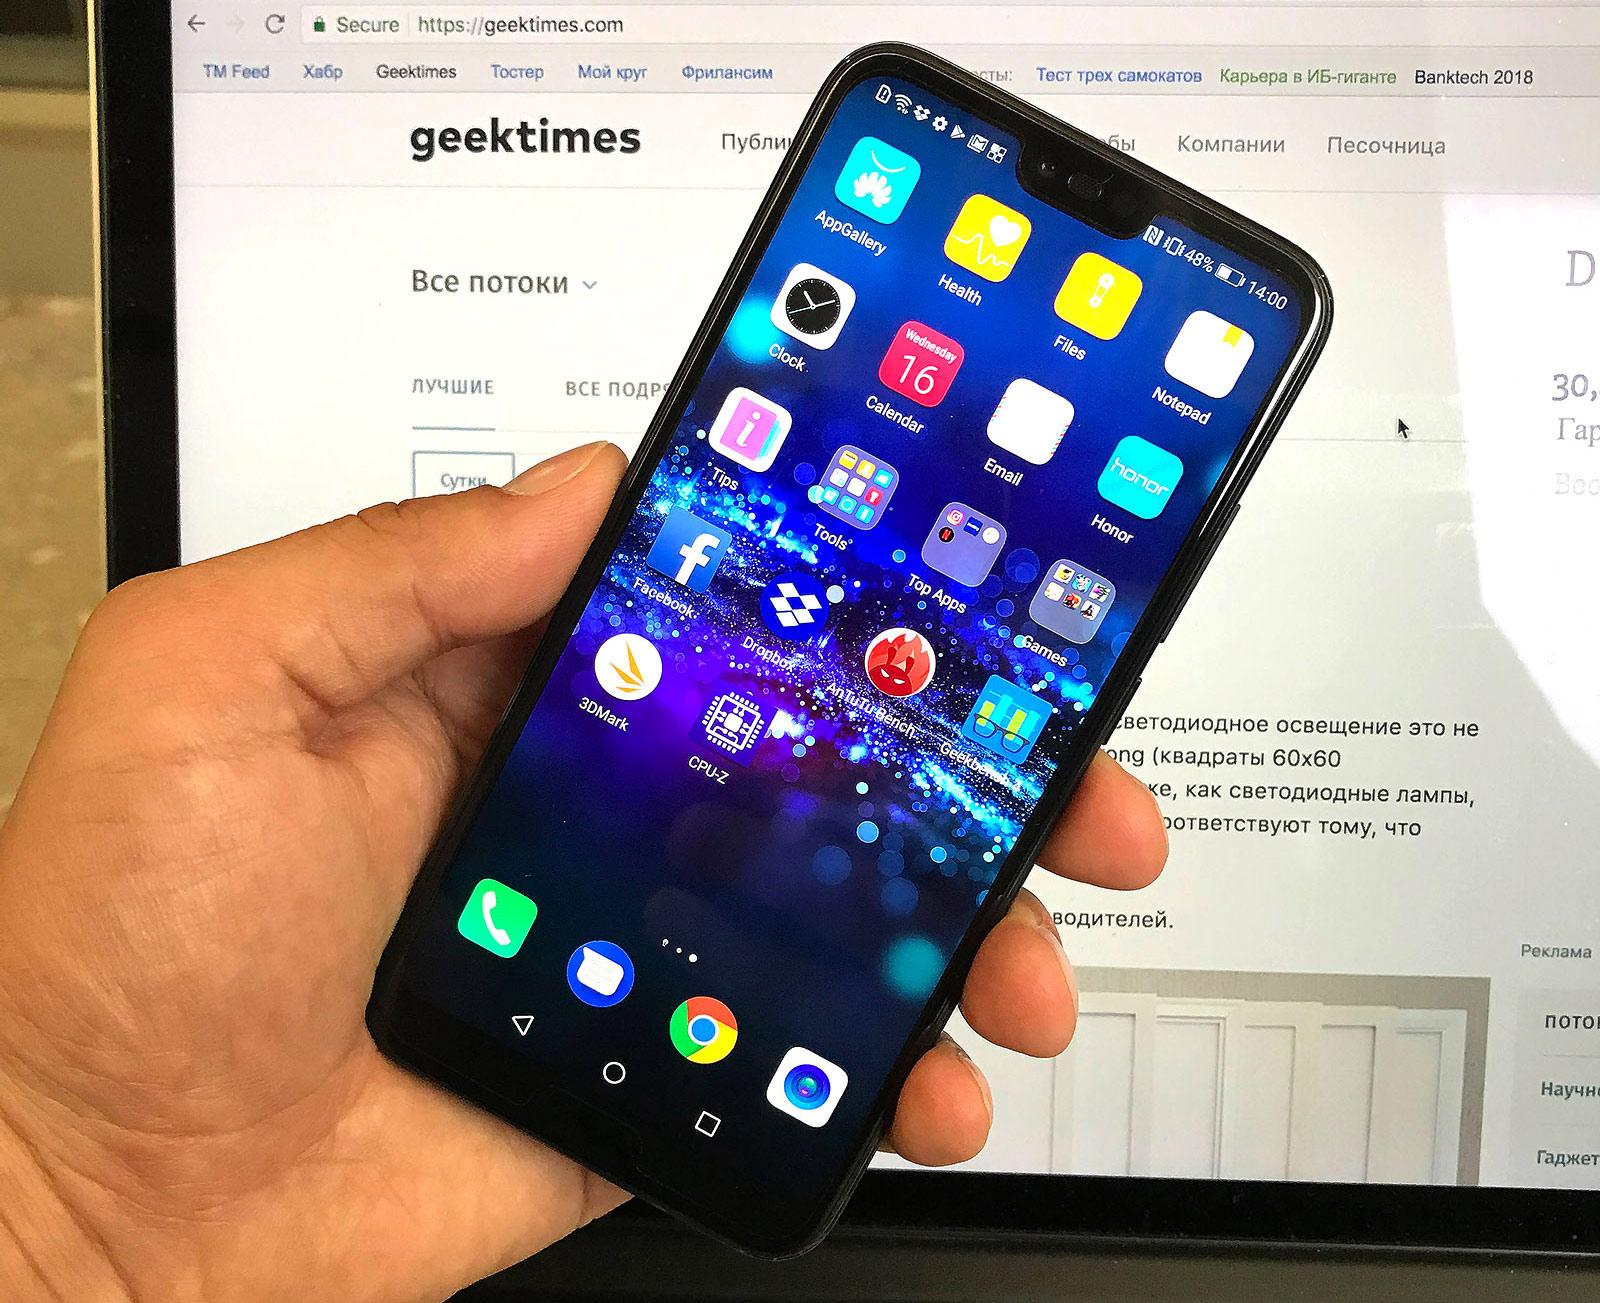 Как фотографирует новый Honor 10. Сравниваем с Huawei P20 и iPhone 7 Plus